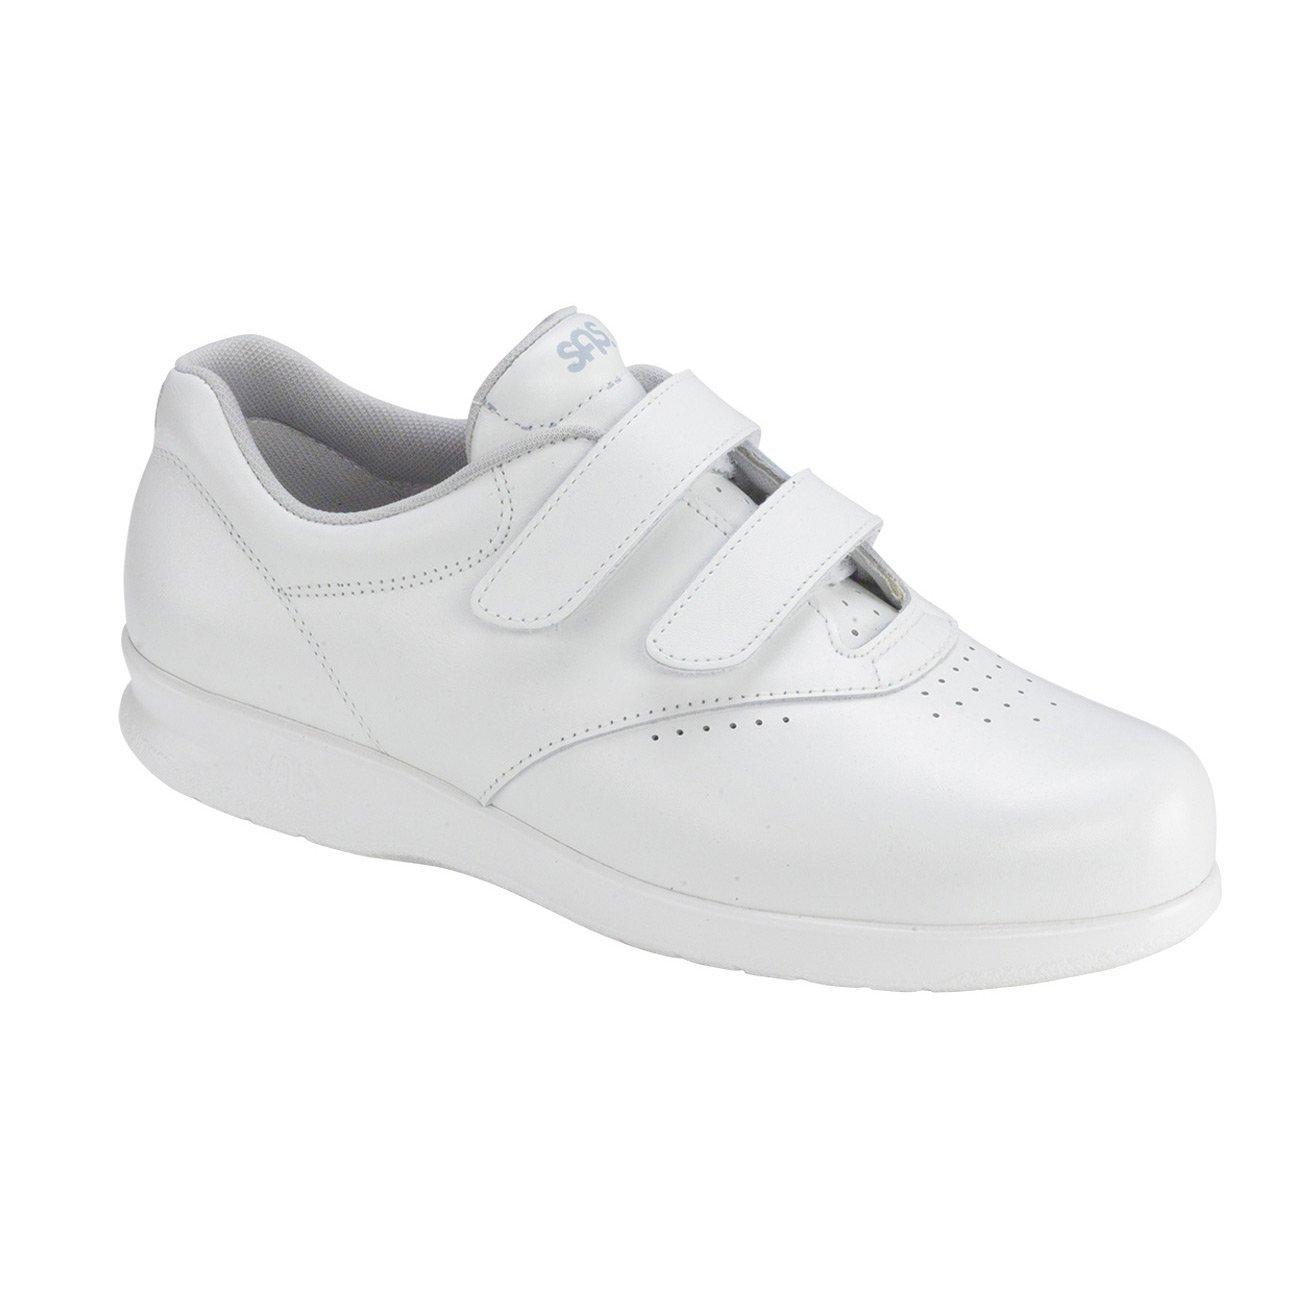 SAS Womens Me Too Leather Low Top Walking Shoes B01MFAW802 6 (W) Wide|White